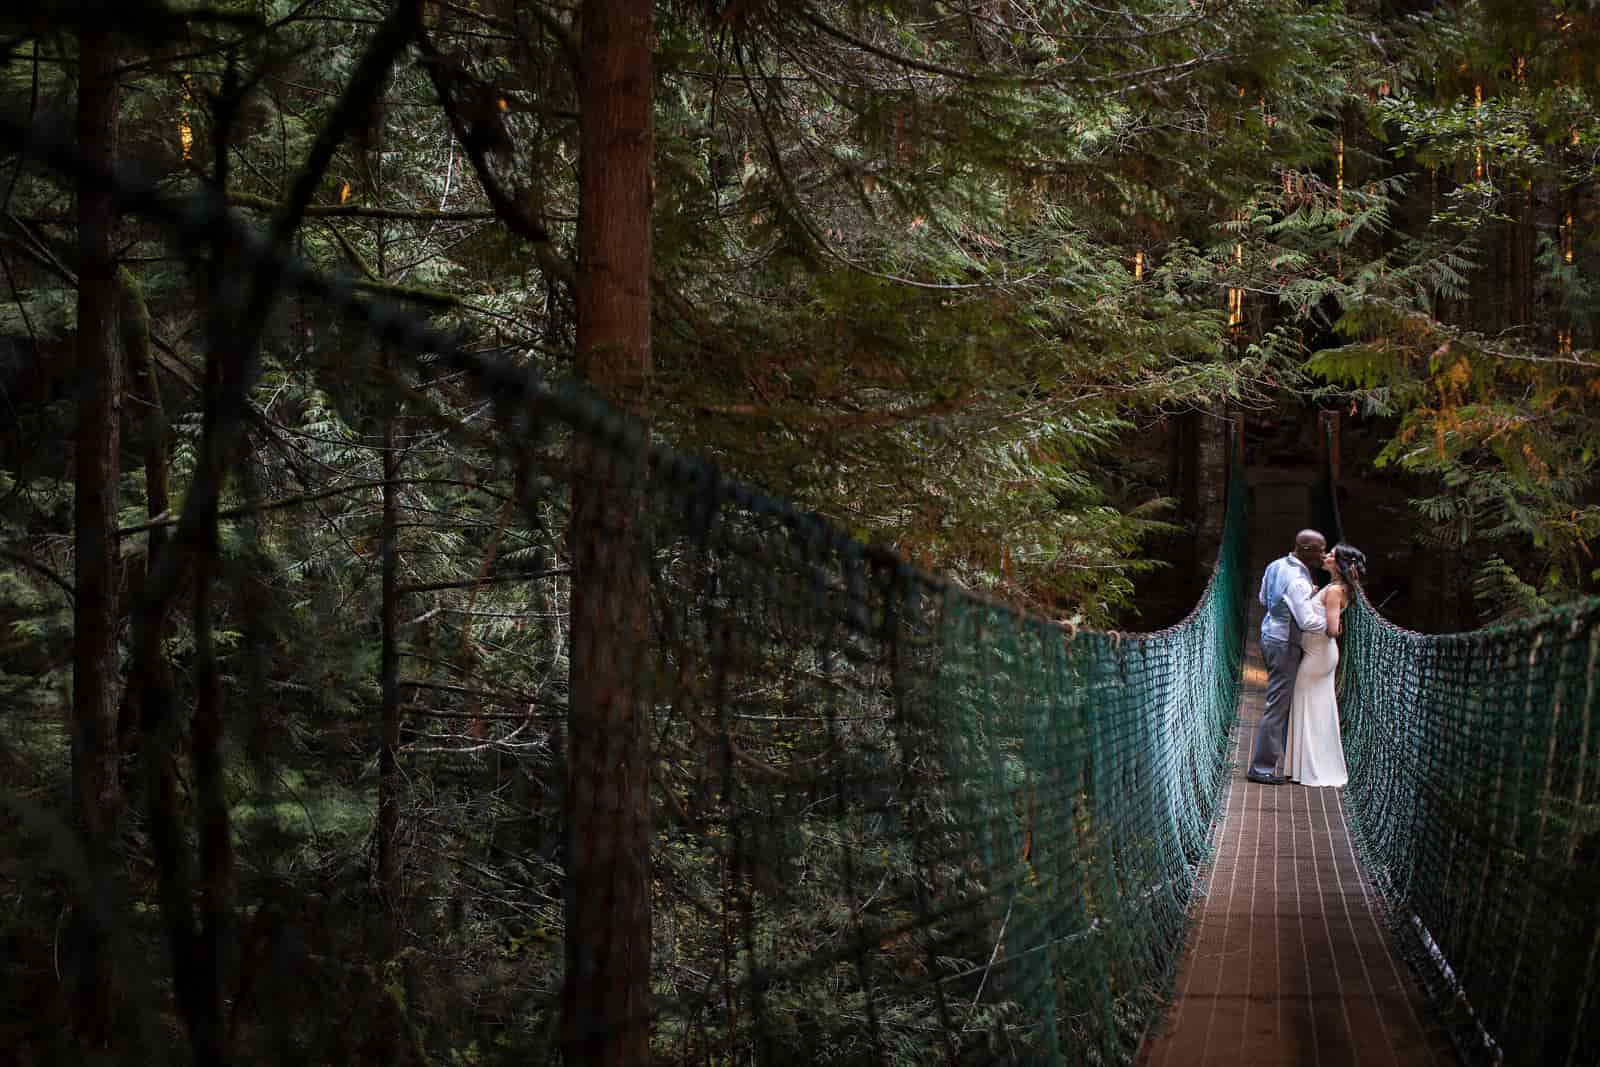 A newlywed couple shares a kiss on a suspension bridge. Photo by Marlboro Wang.